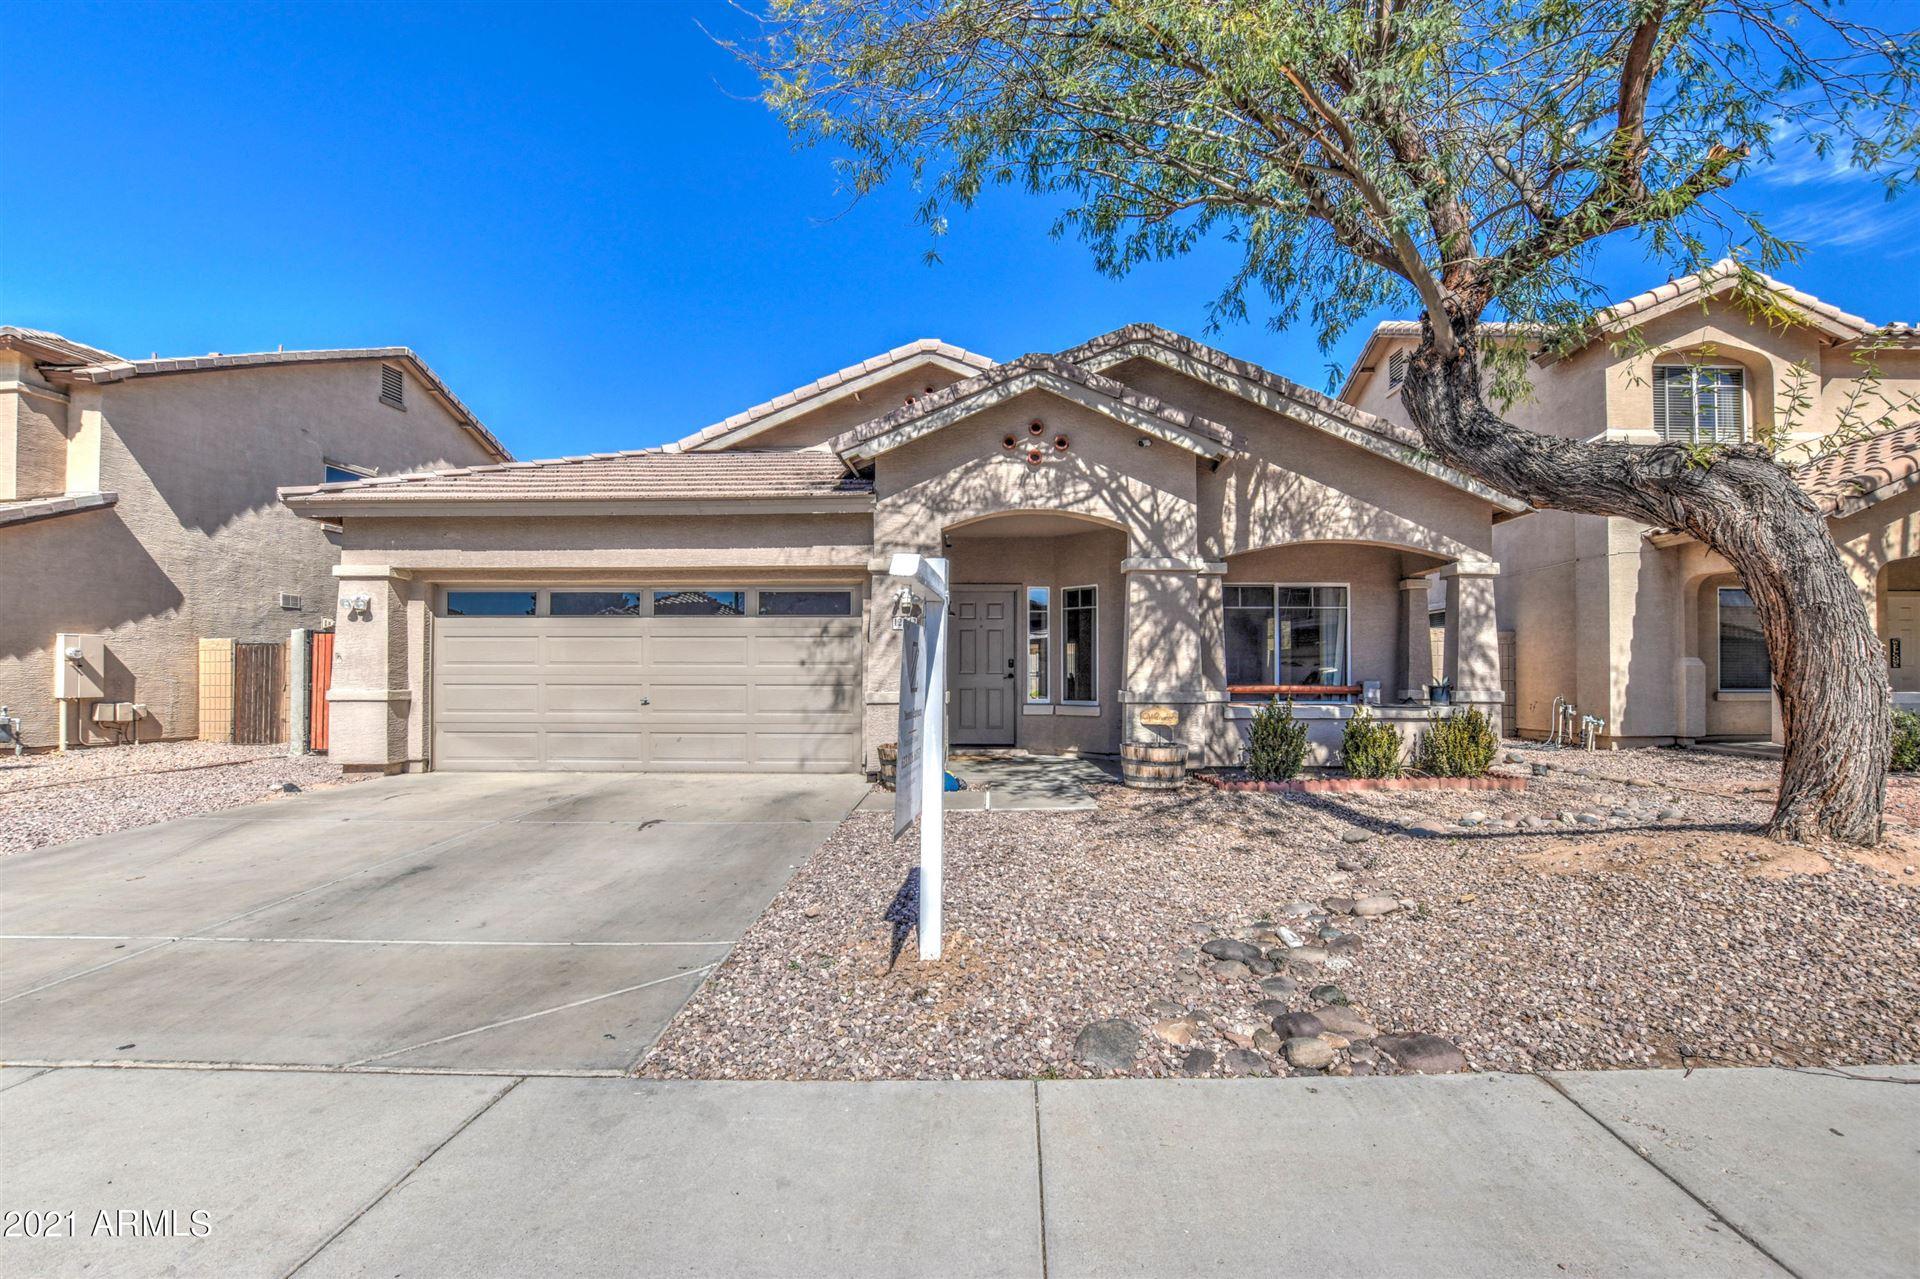 Photo of 12242 W WASHINGTON Street, Avondale, AZ 85323 (MLS # 6197849)